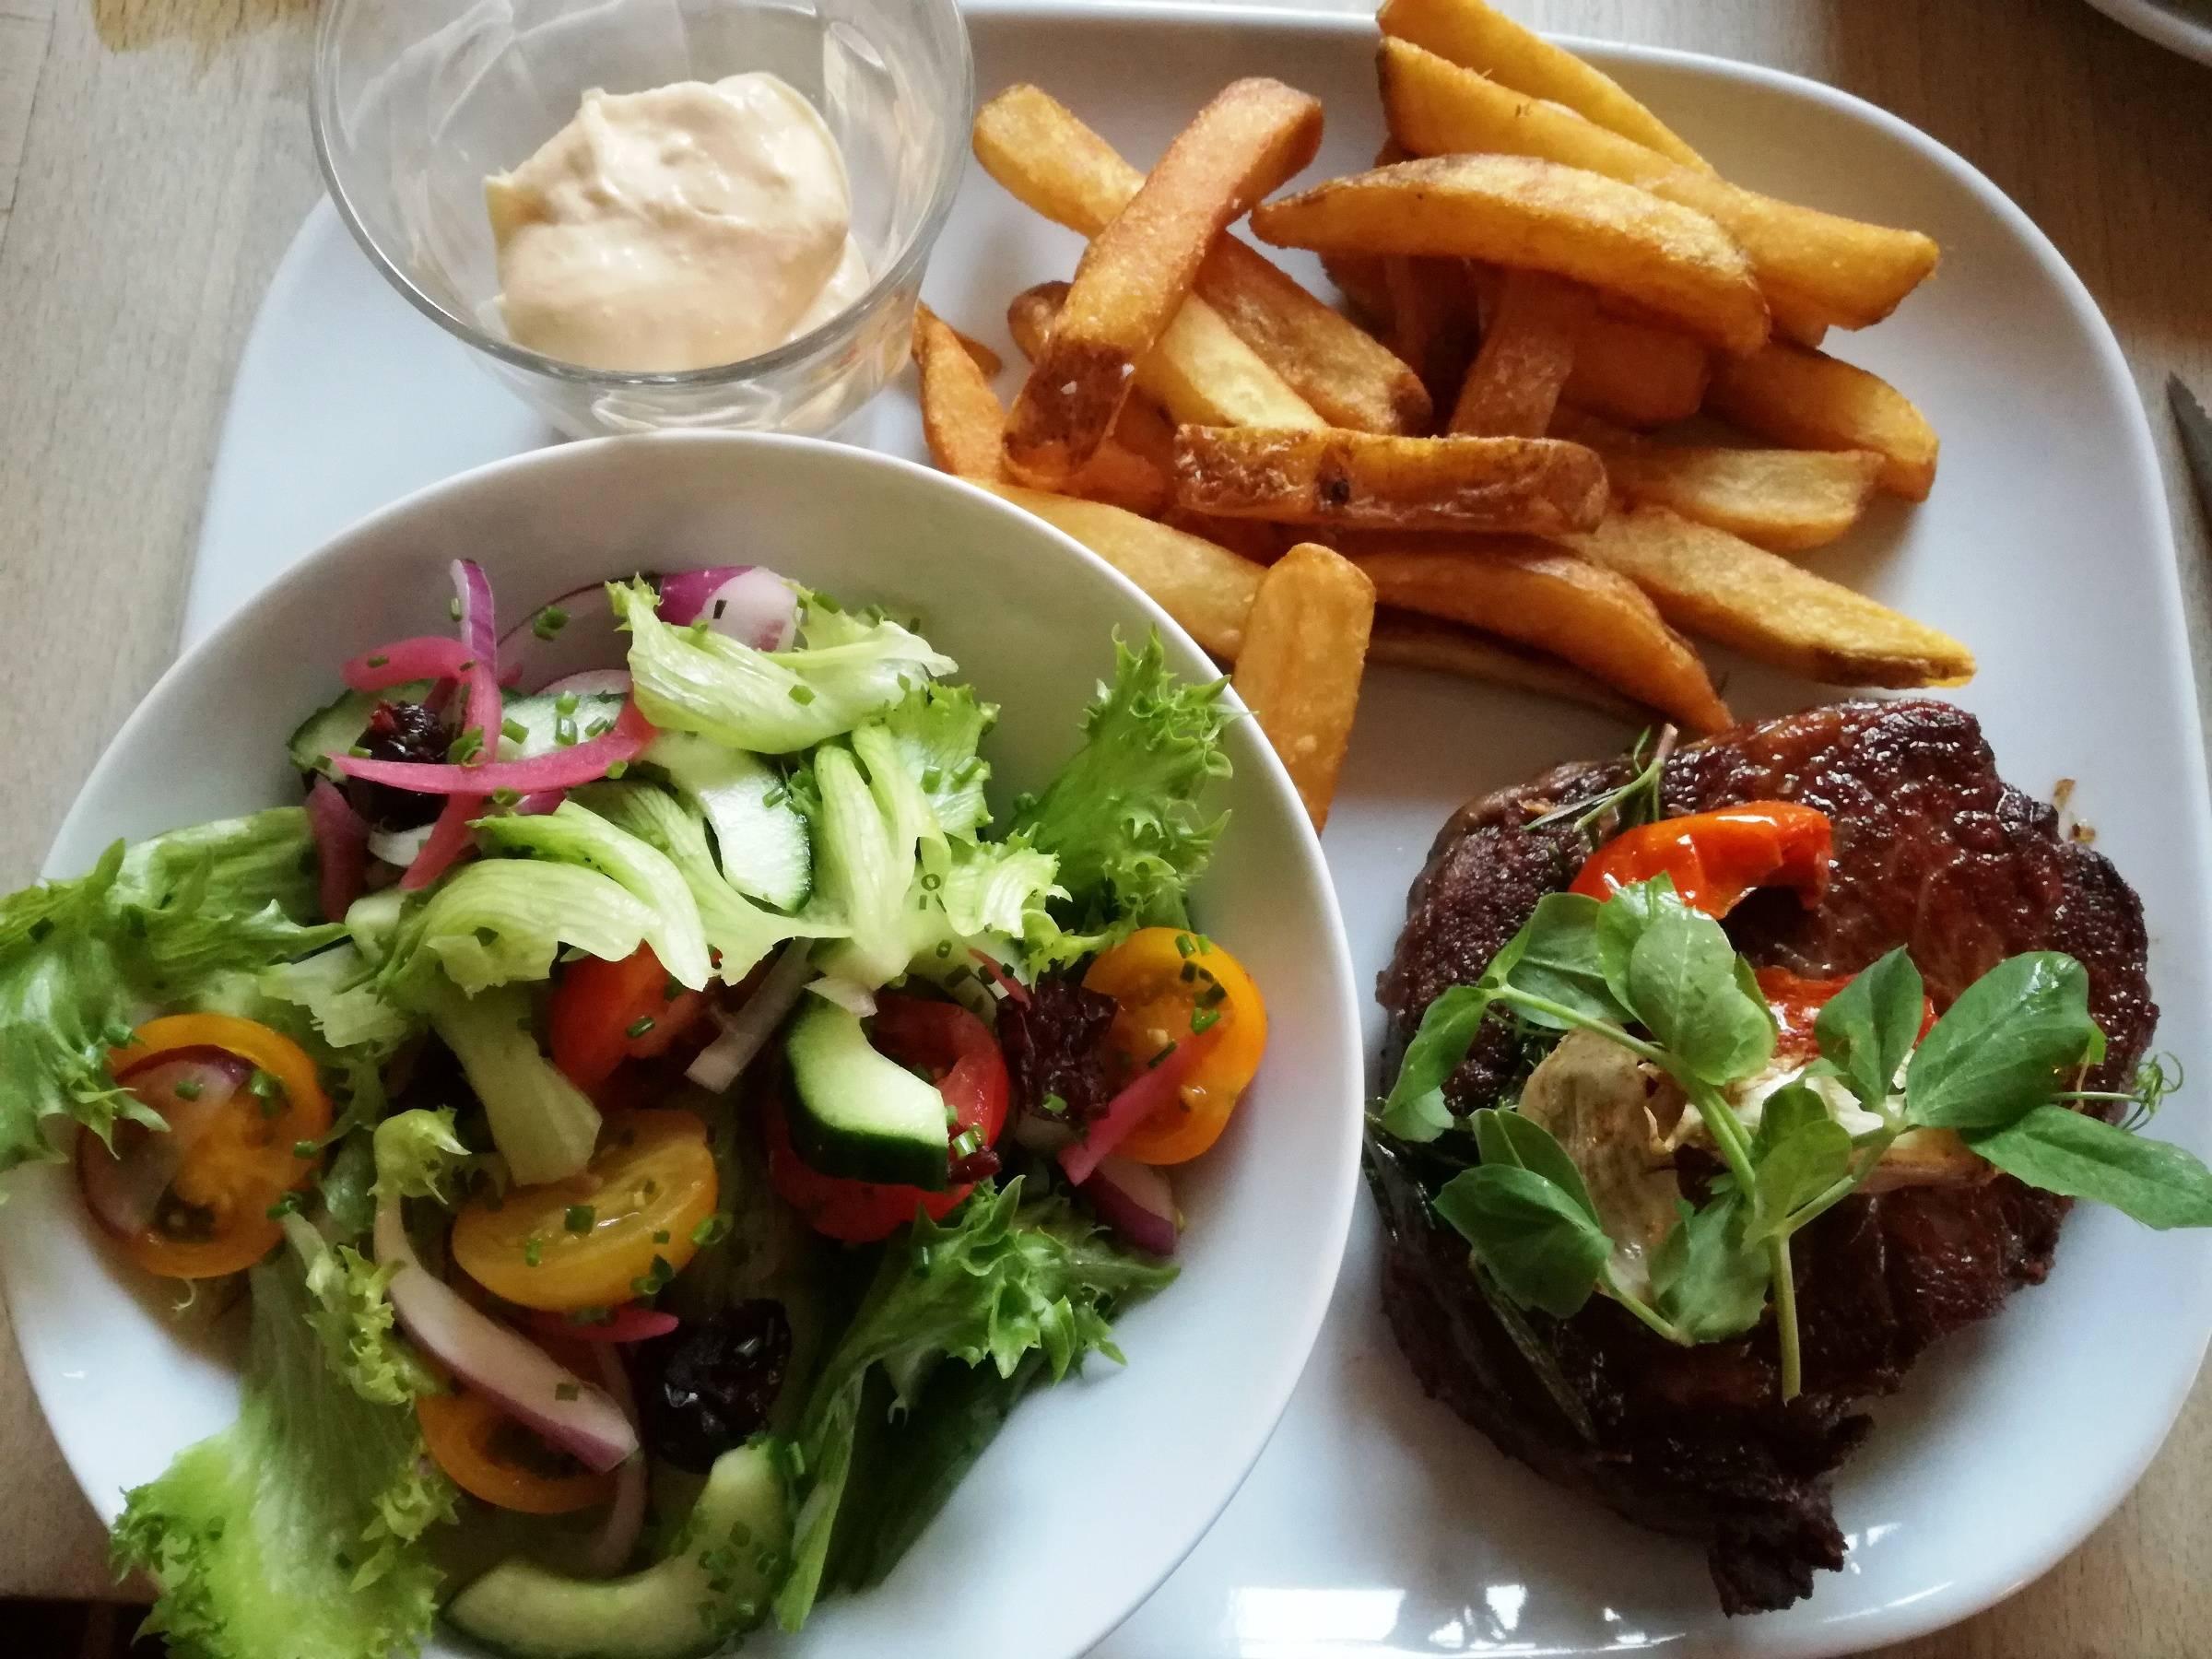 Steak og salat